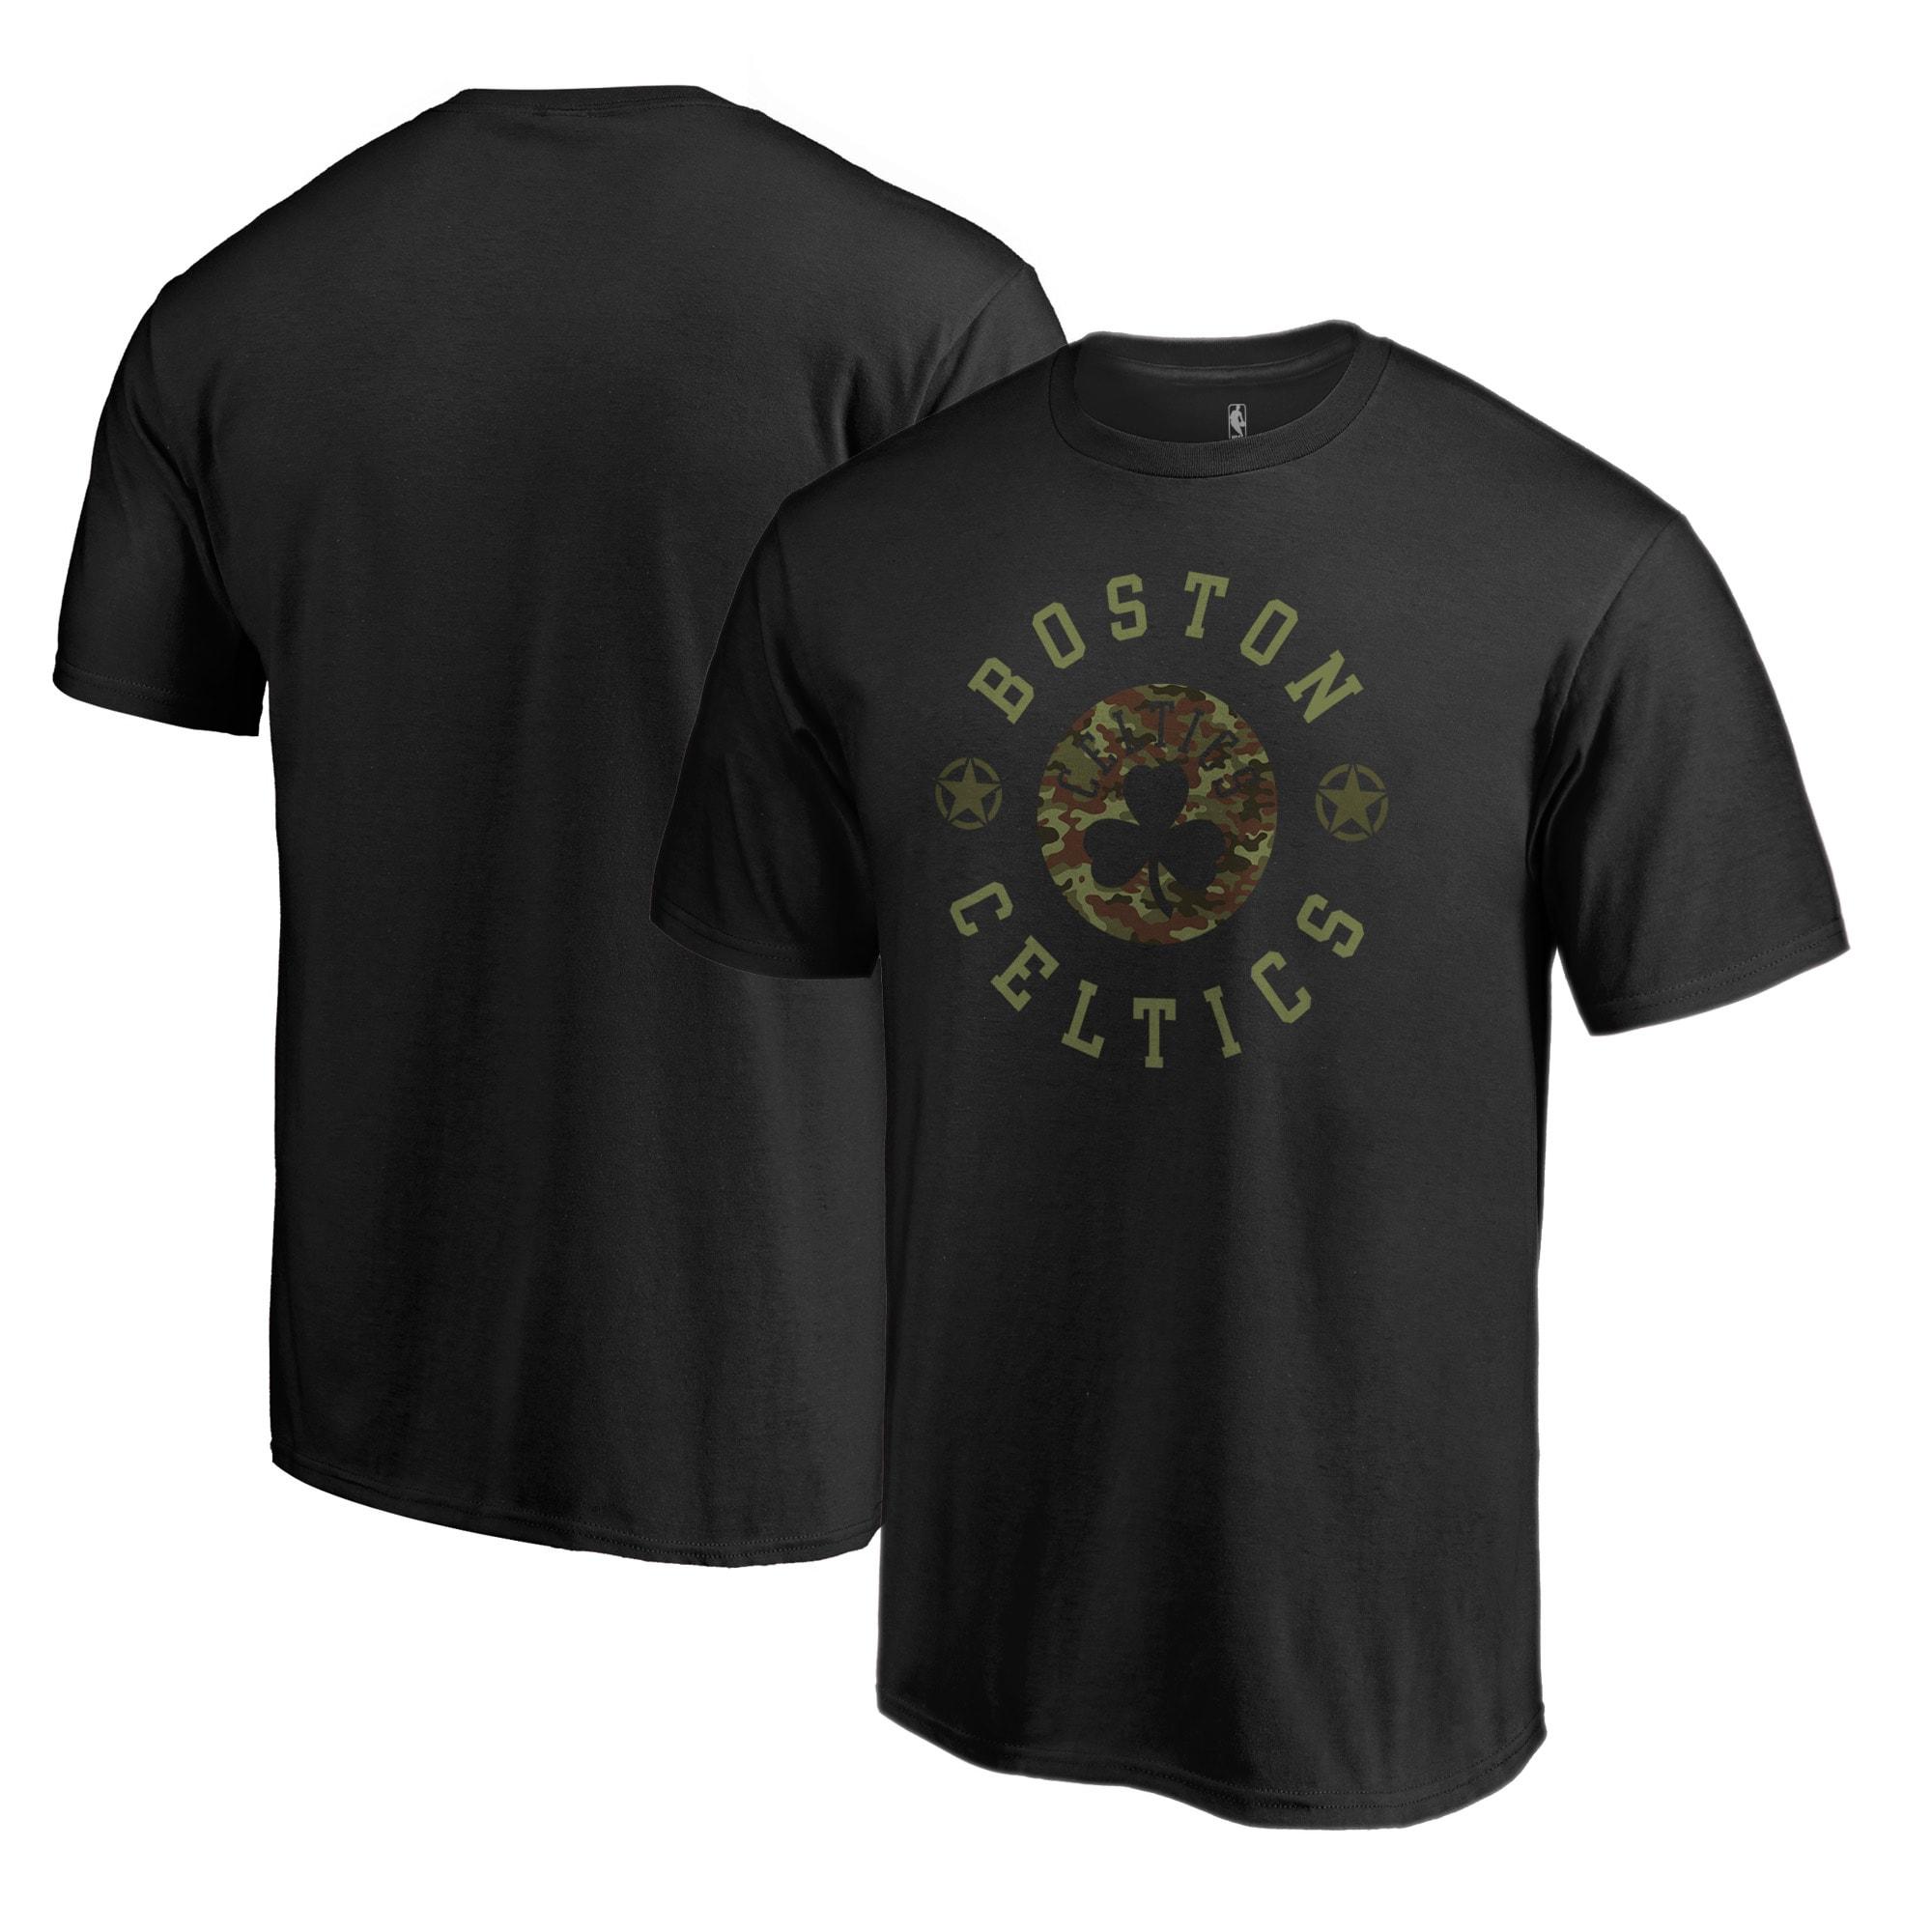 Boston Celtics Fanatics Branded Liberty T-Shirt - Black